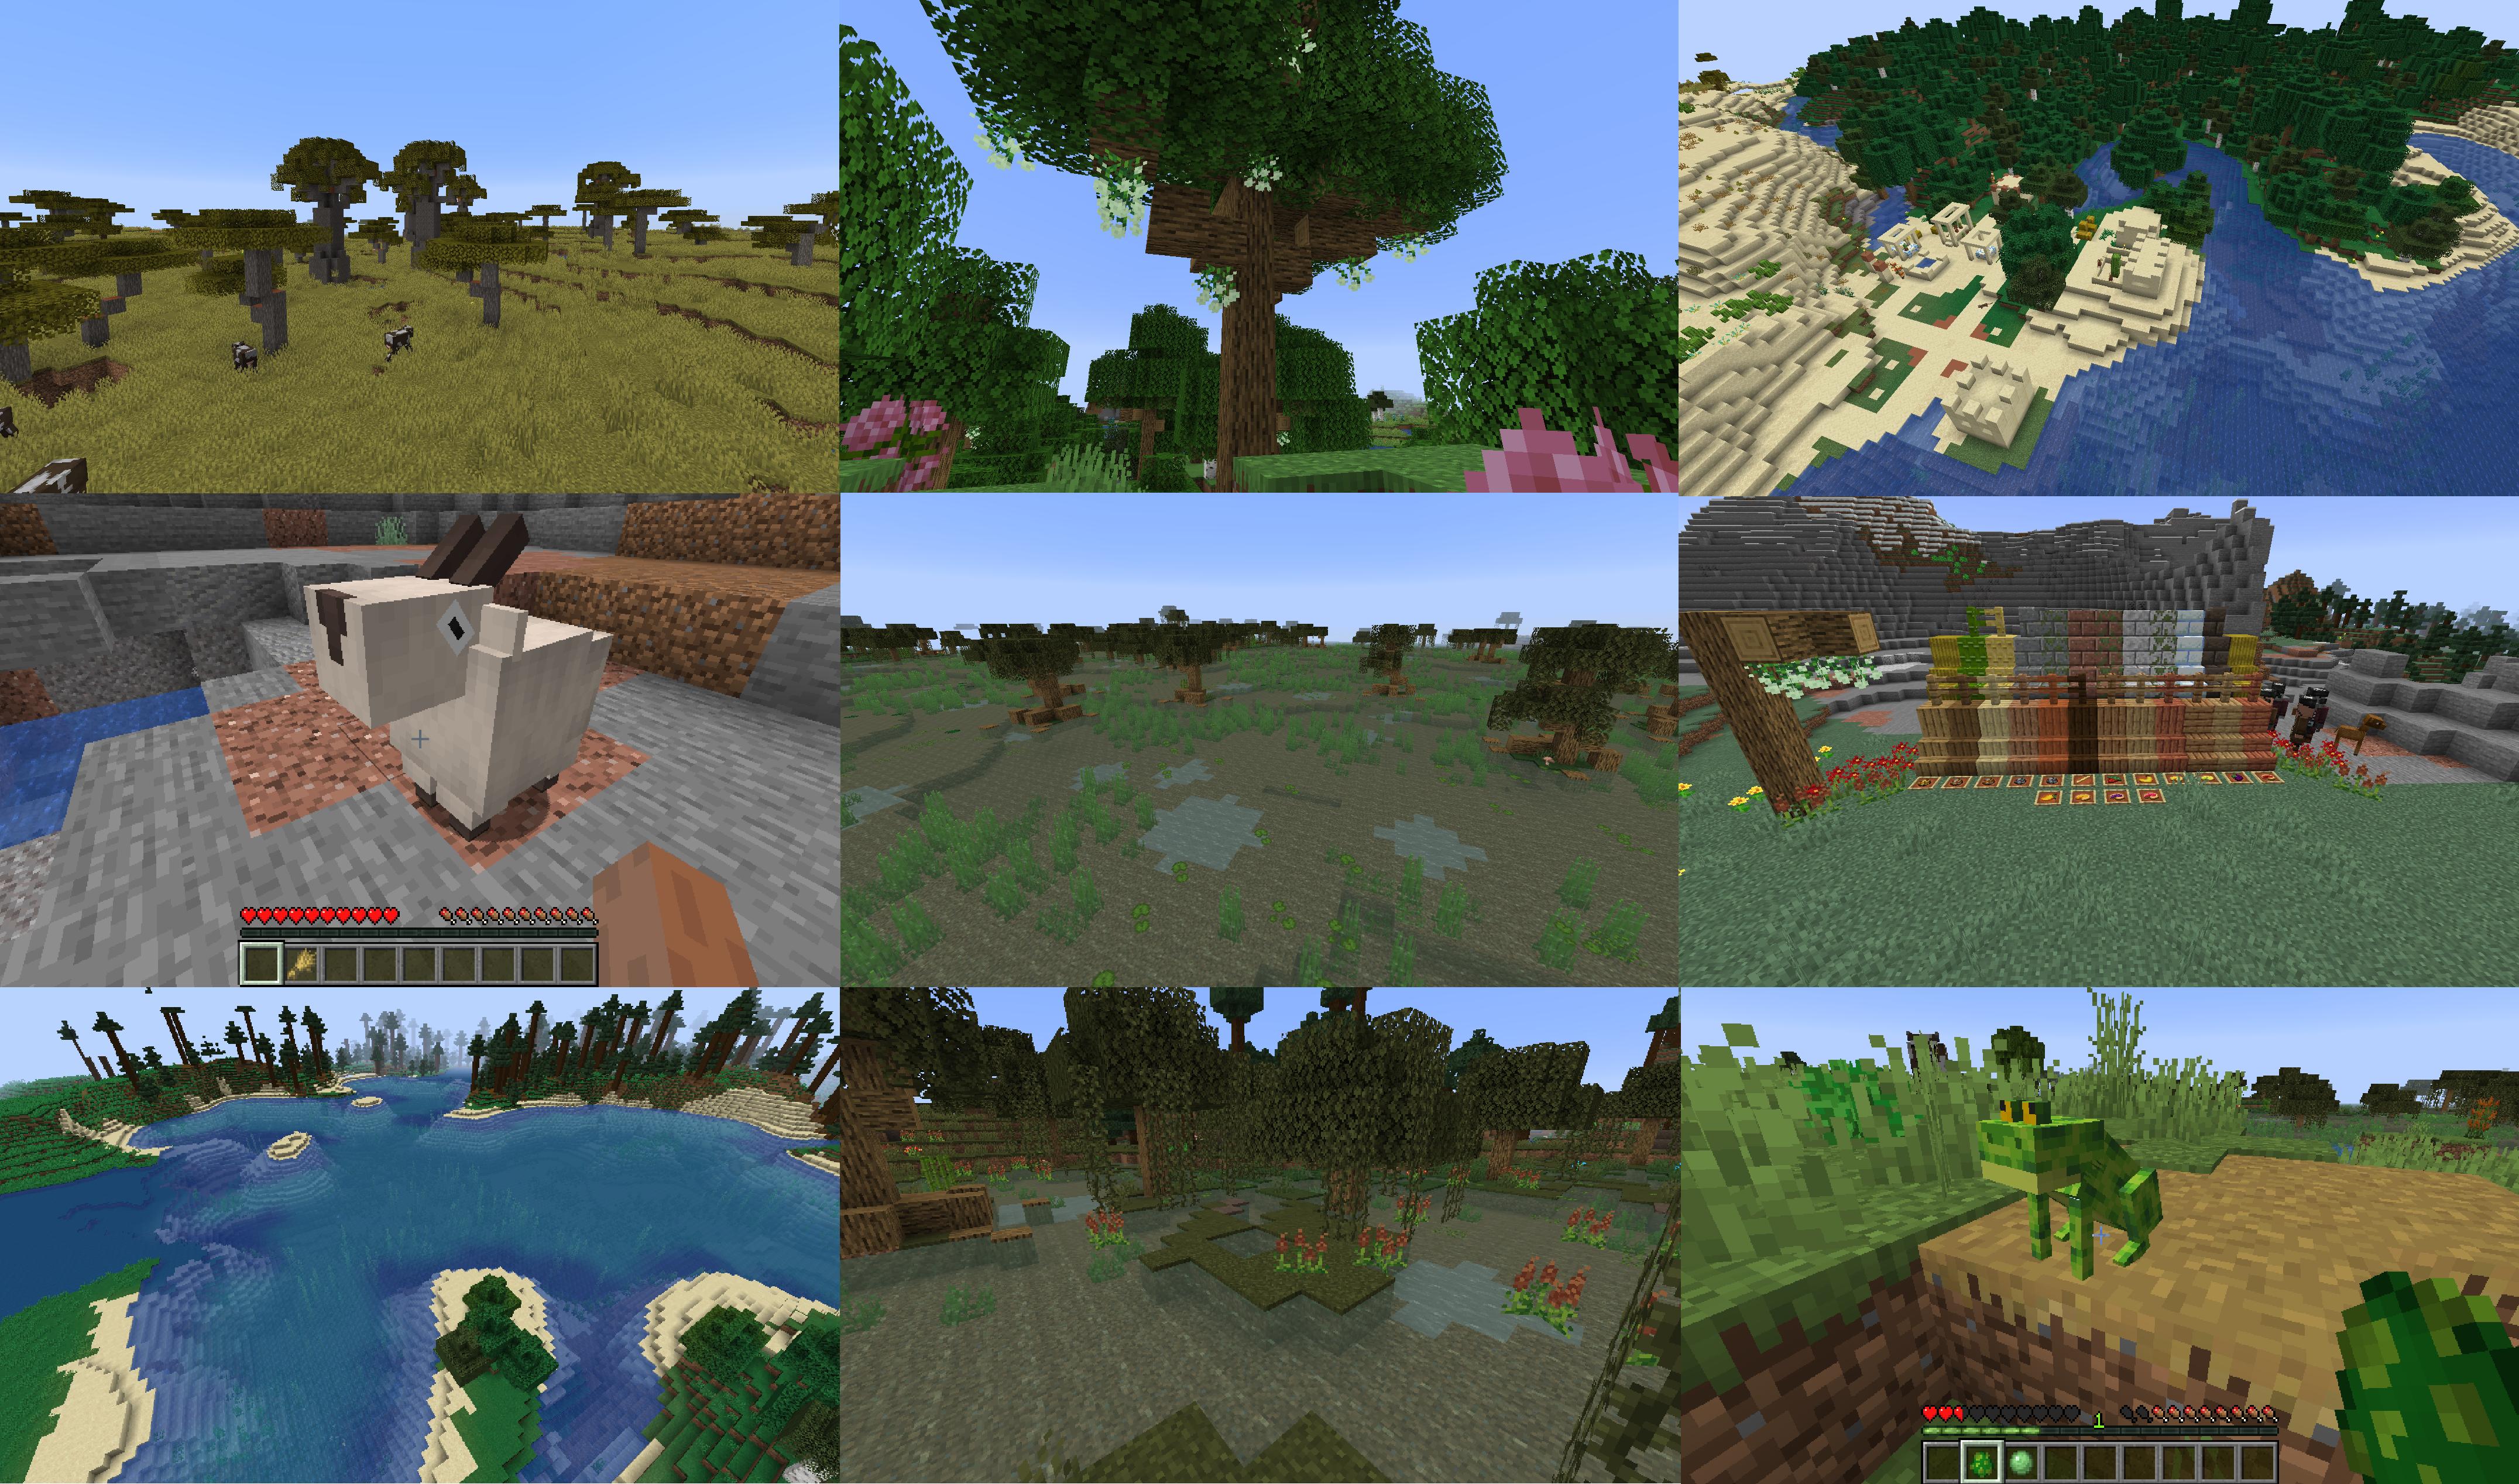 Enhanced Vanilla Java Edition Mod For Minecraft 1 15 1 14 4 Download Mods For Minecraft